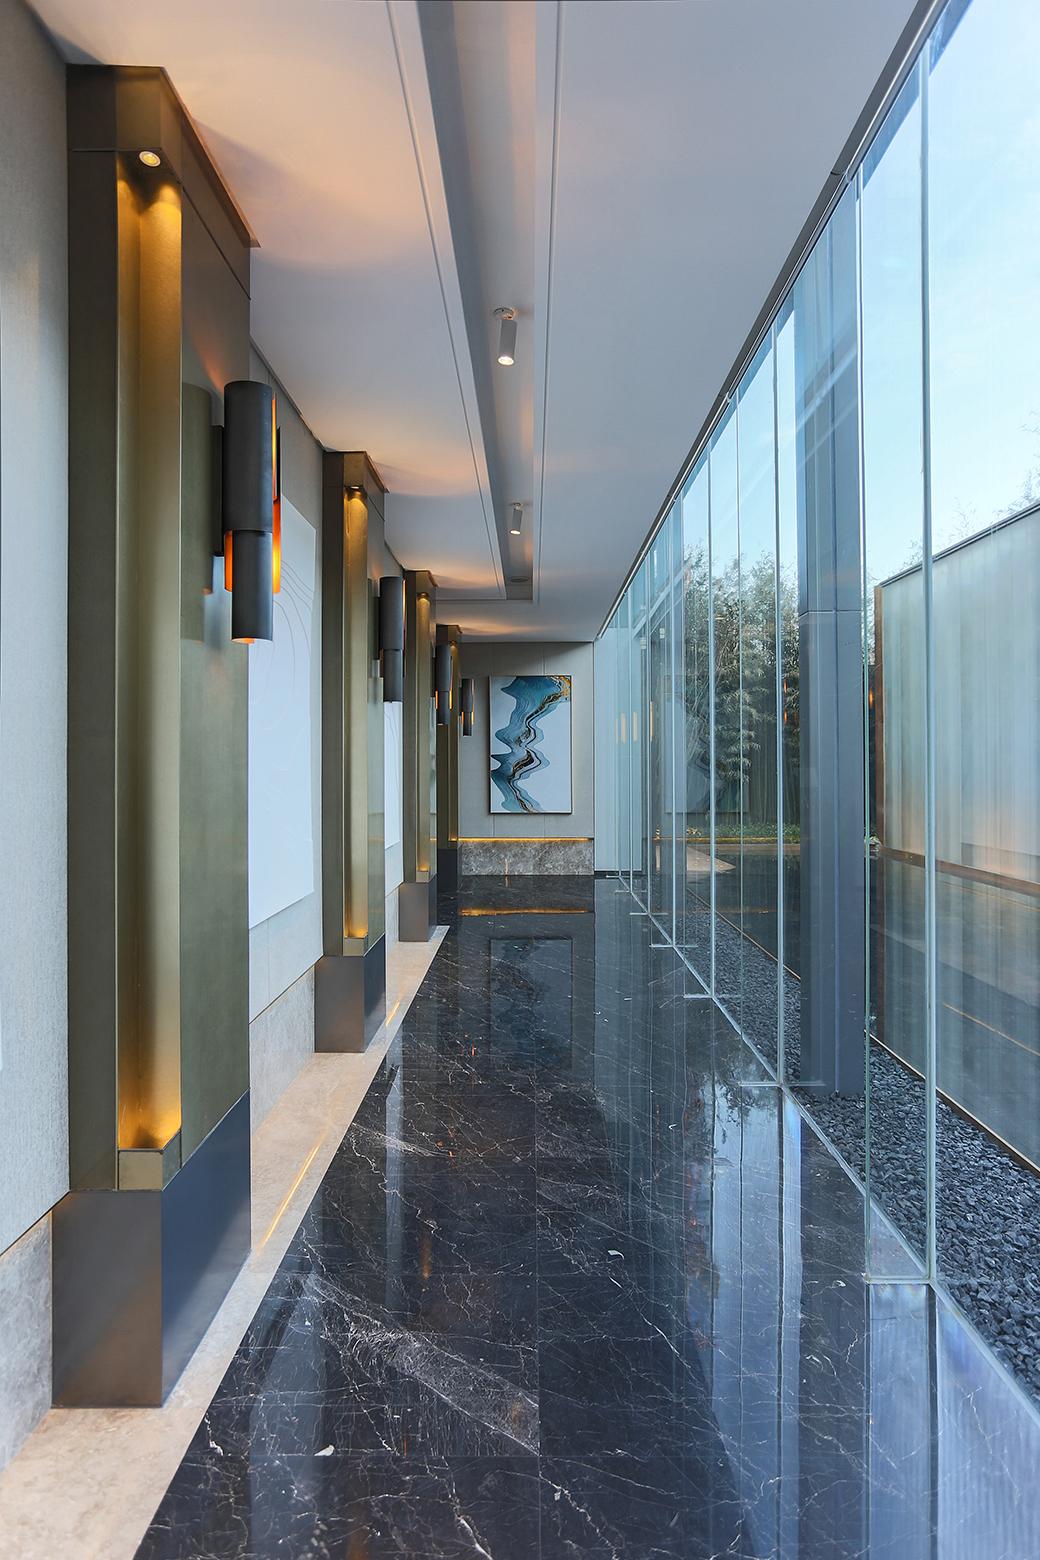 3_Corridor-1-70